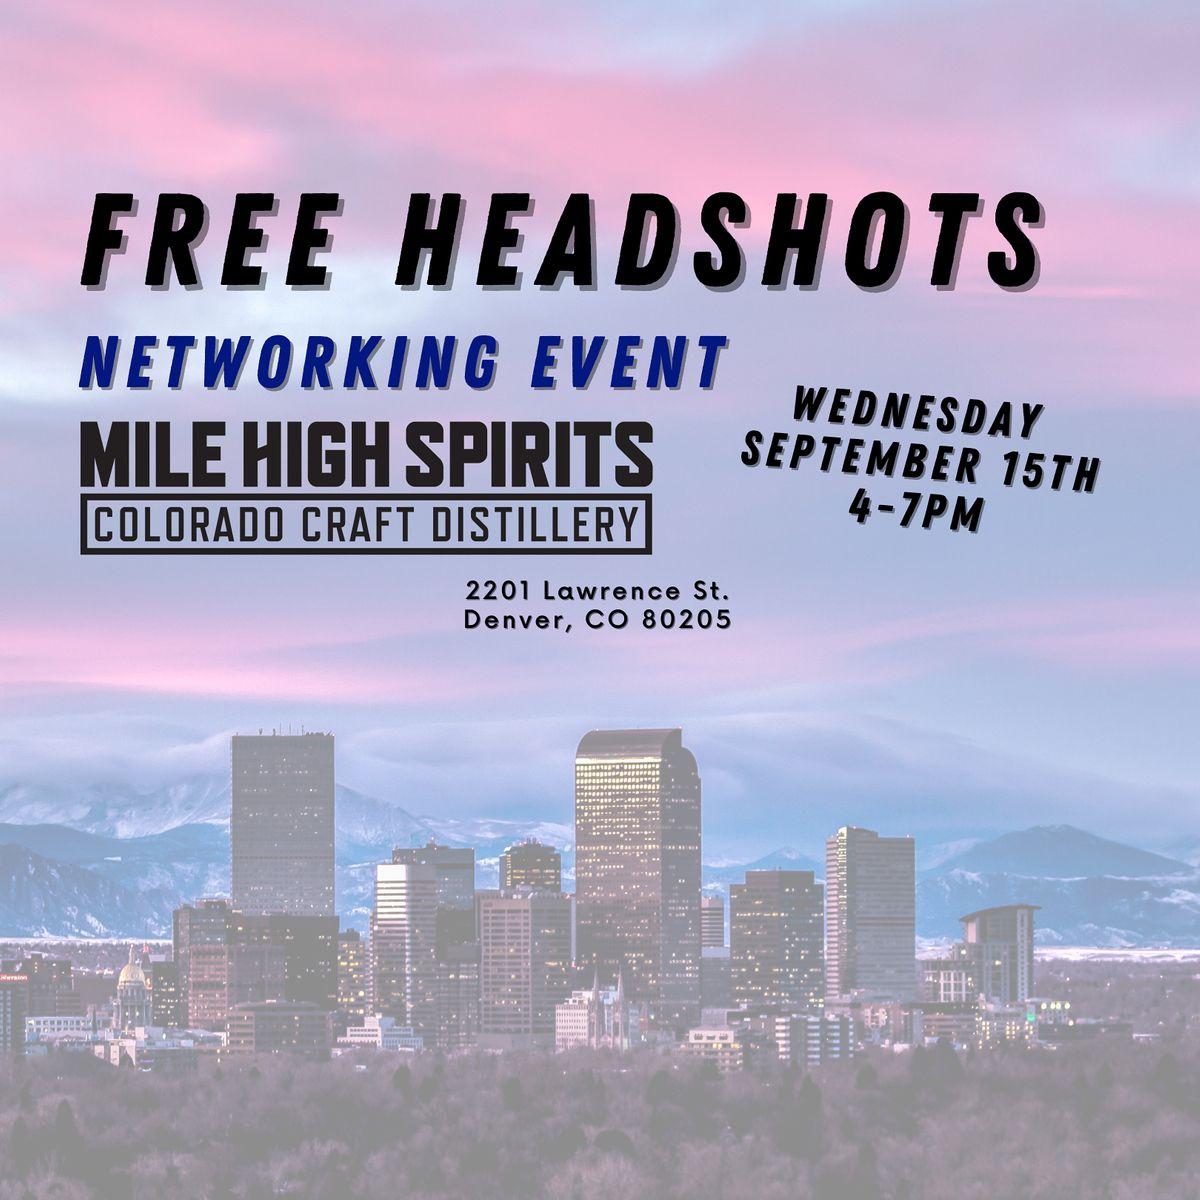 FREE Headshots - Networking Event